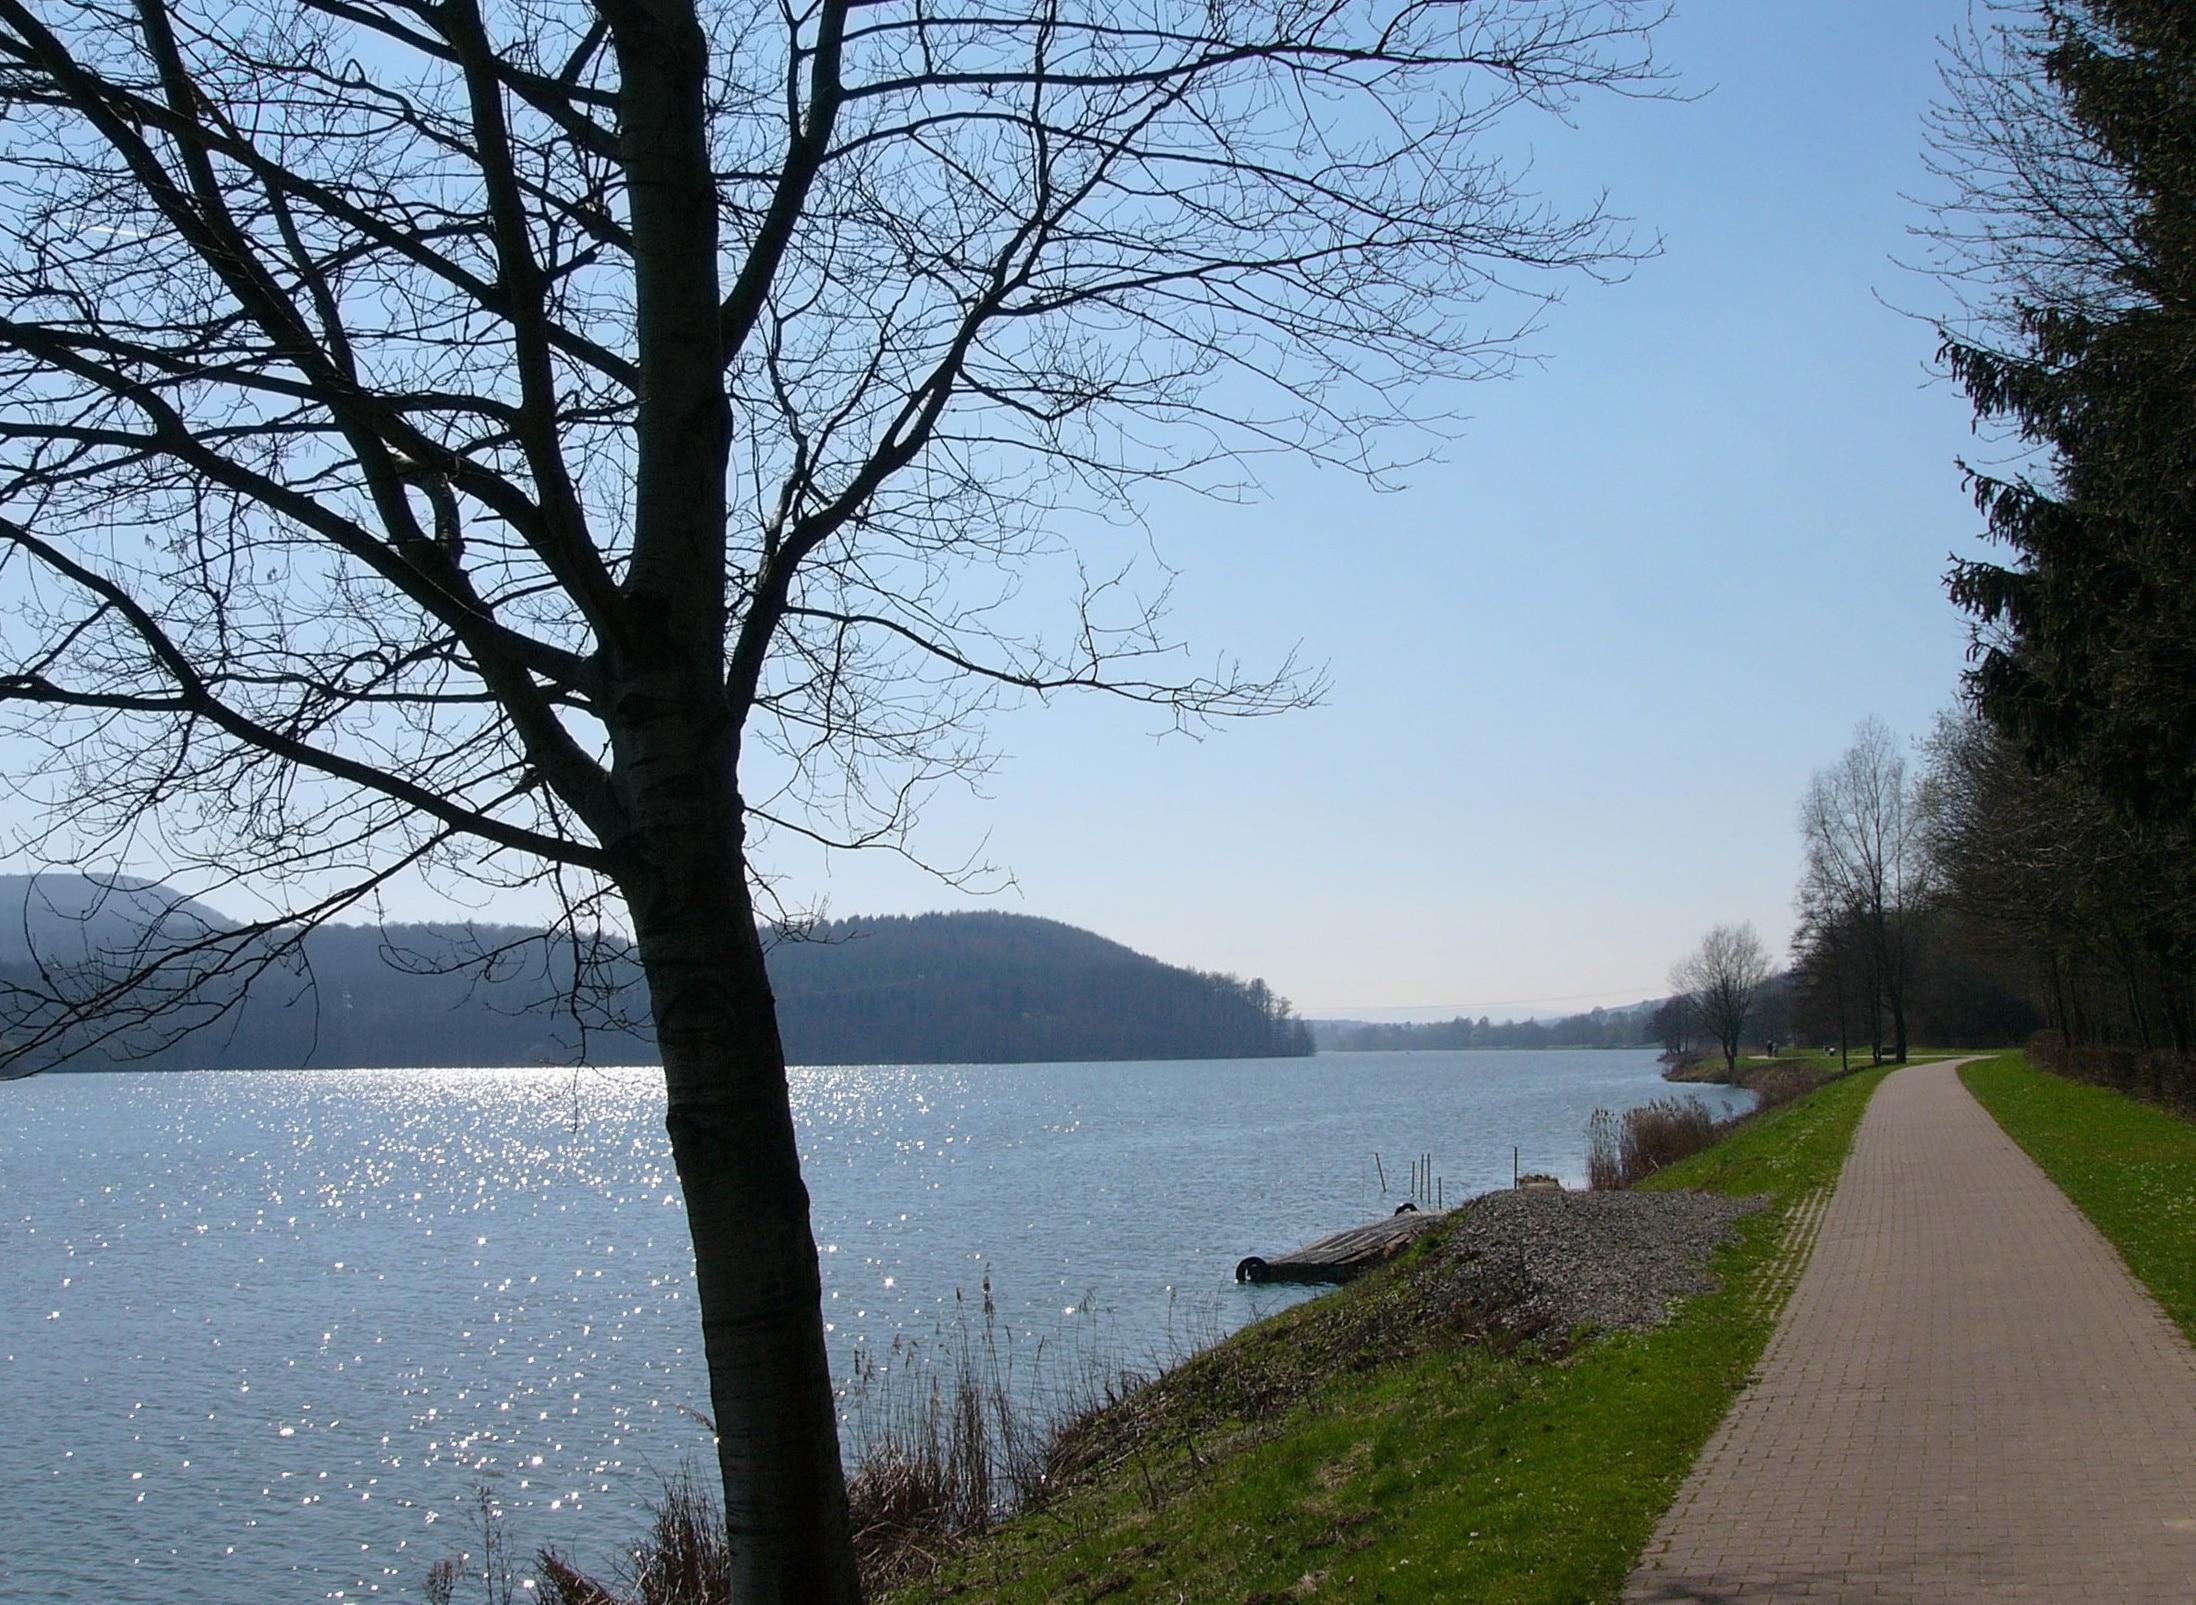 Schieder-Schwalenberg, North Rhine-Westphalia, Germany